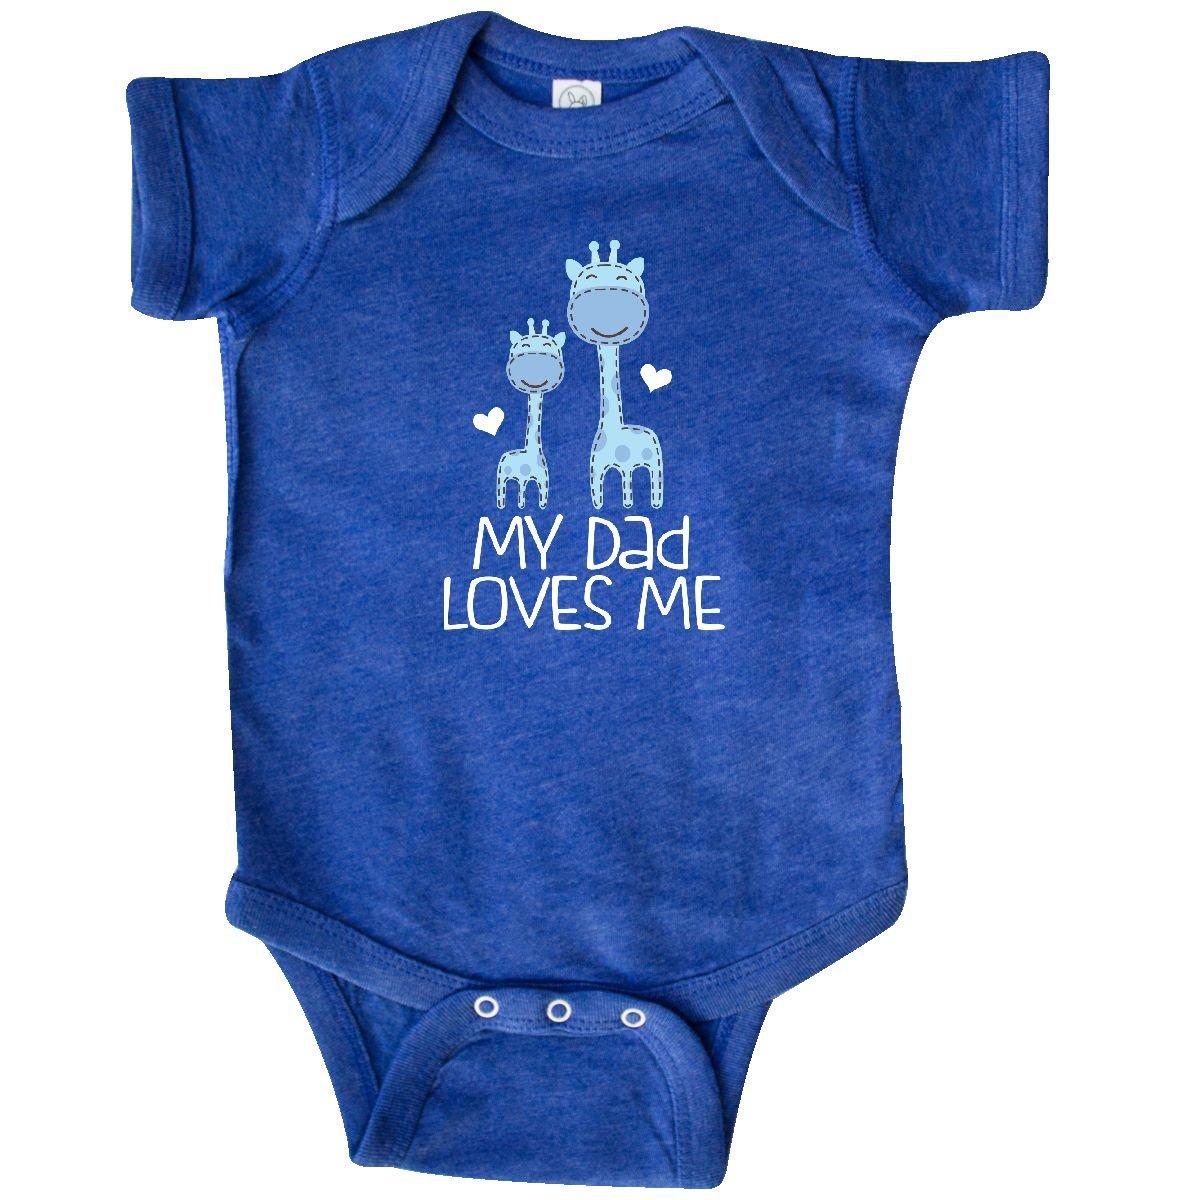 a3ee60499 Amazon.com  inktastic - Dad Loves Me Infant Creeper Newborn Retro ...